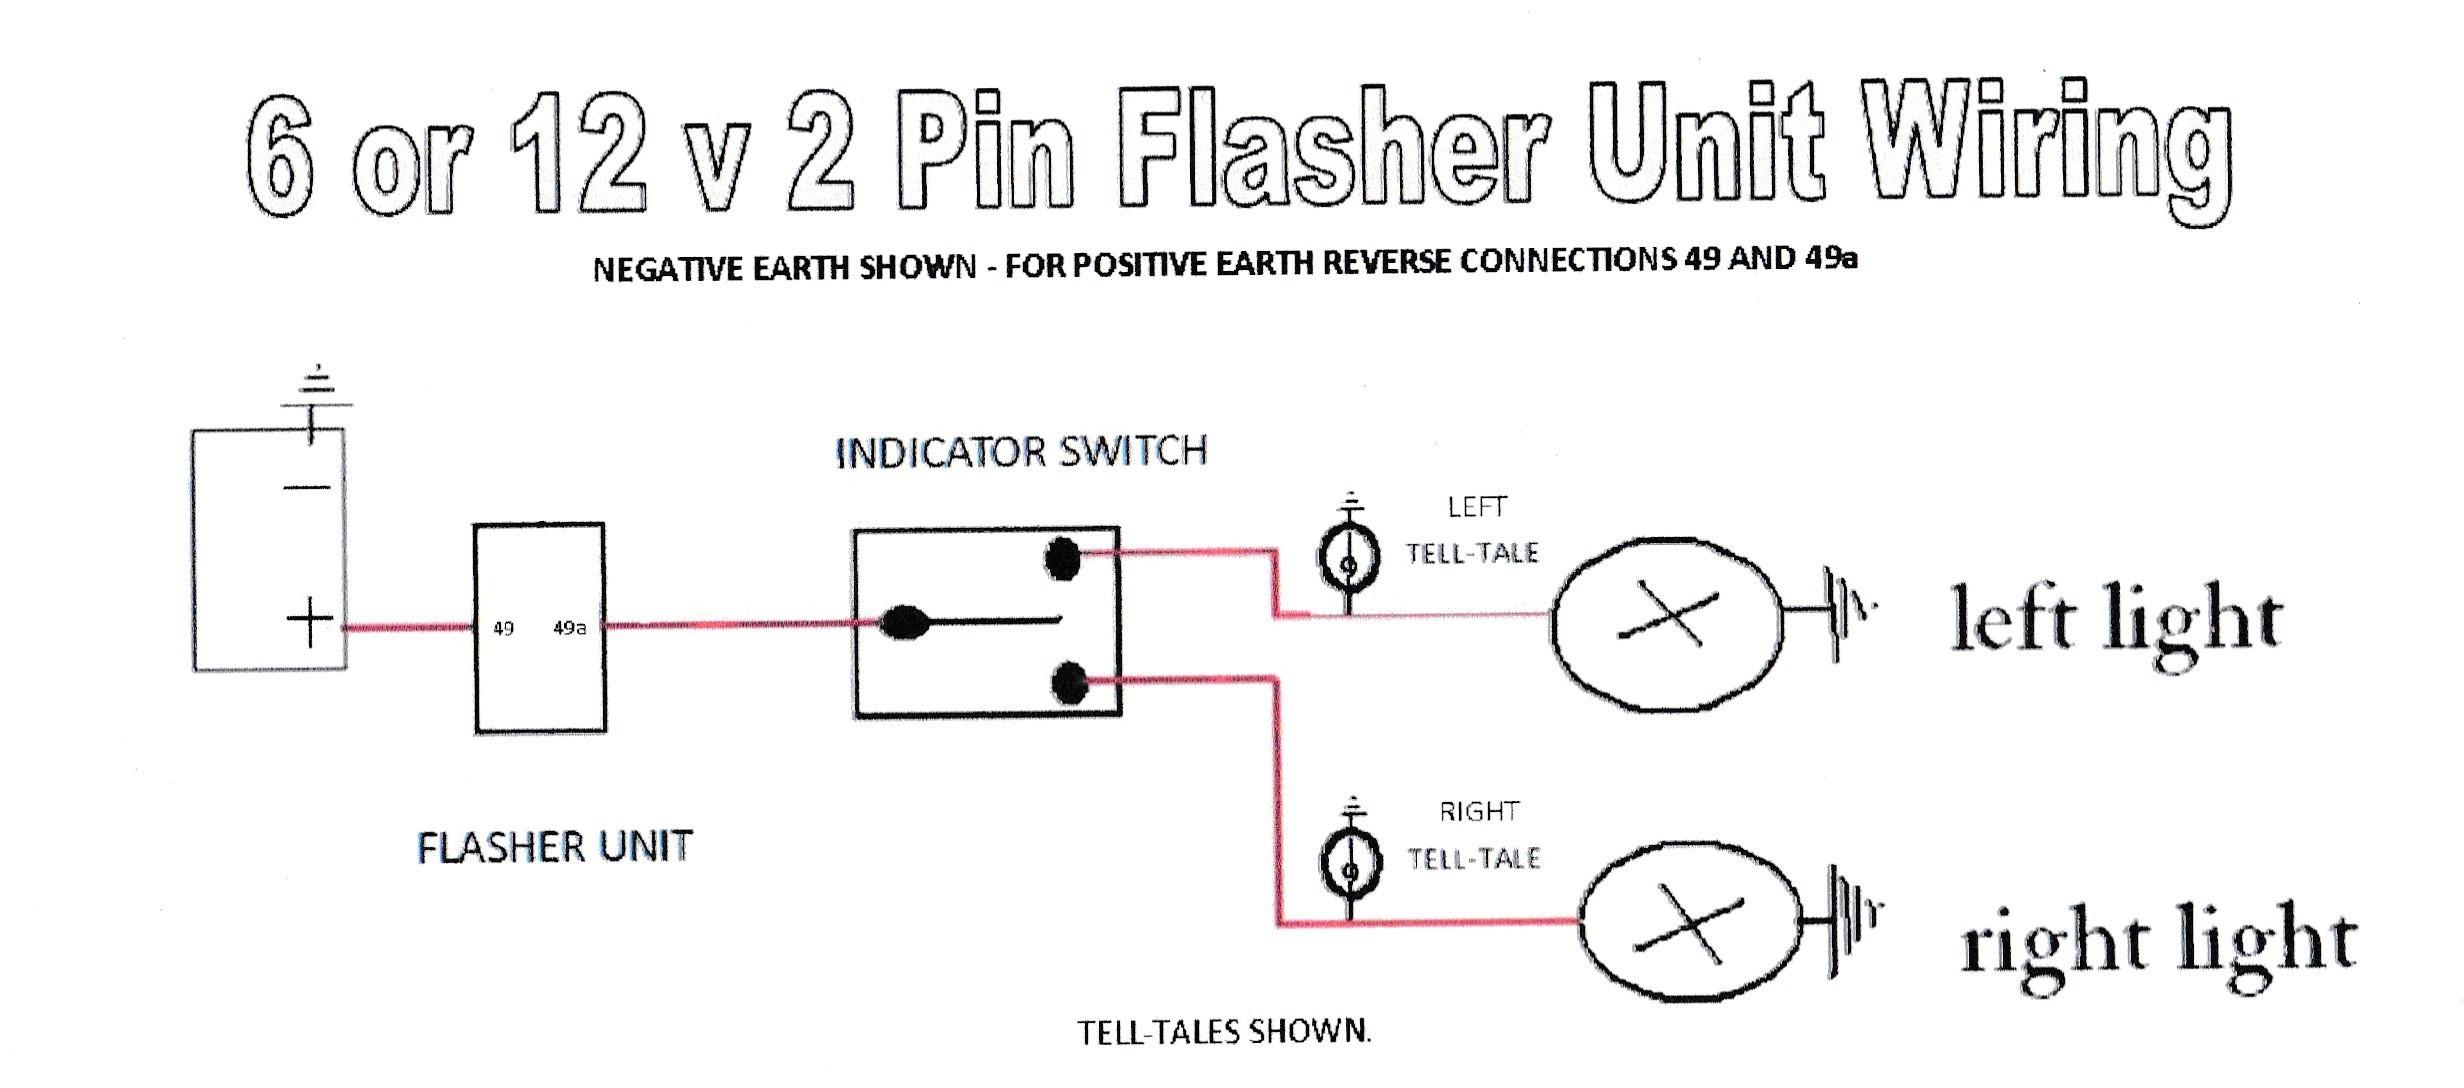 8 Pin Relay Wiring Diagram Inspirational 2 Pin Flasher Relay Wiring Diagram Wiring Diagram